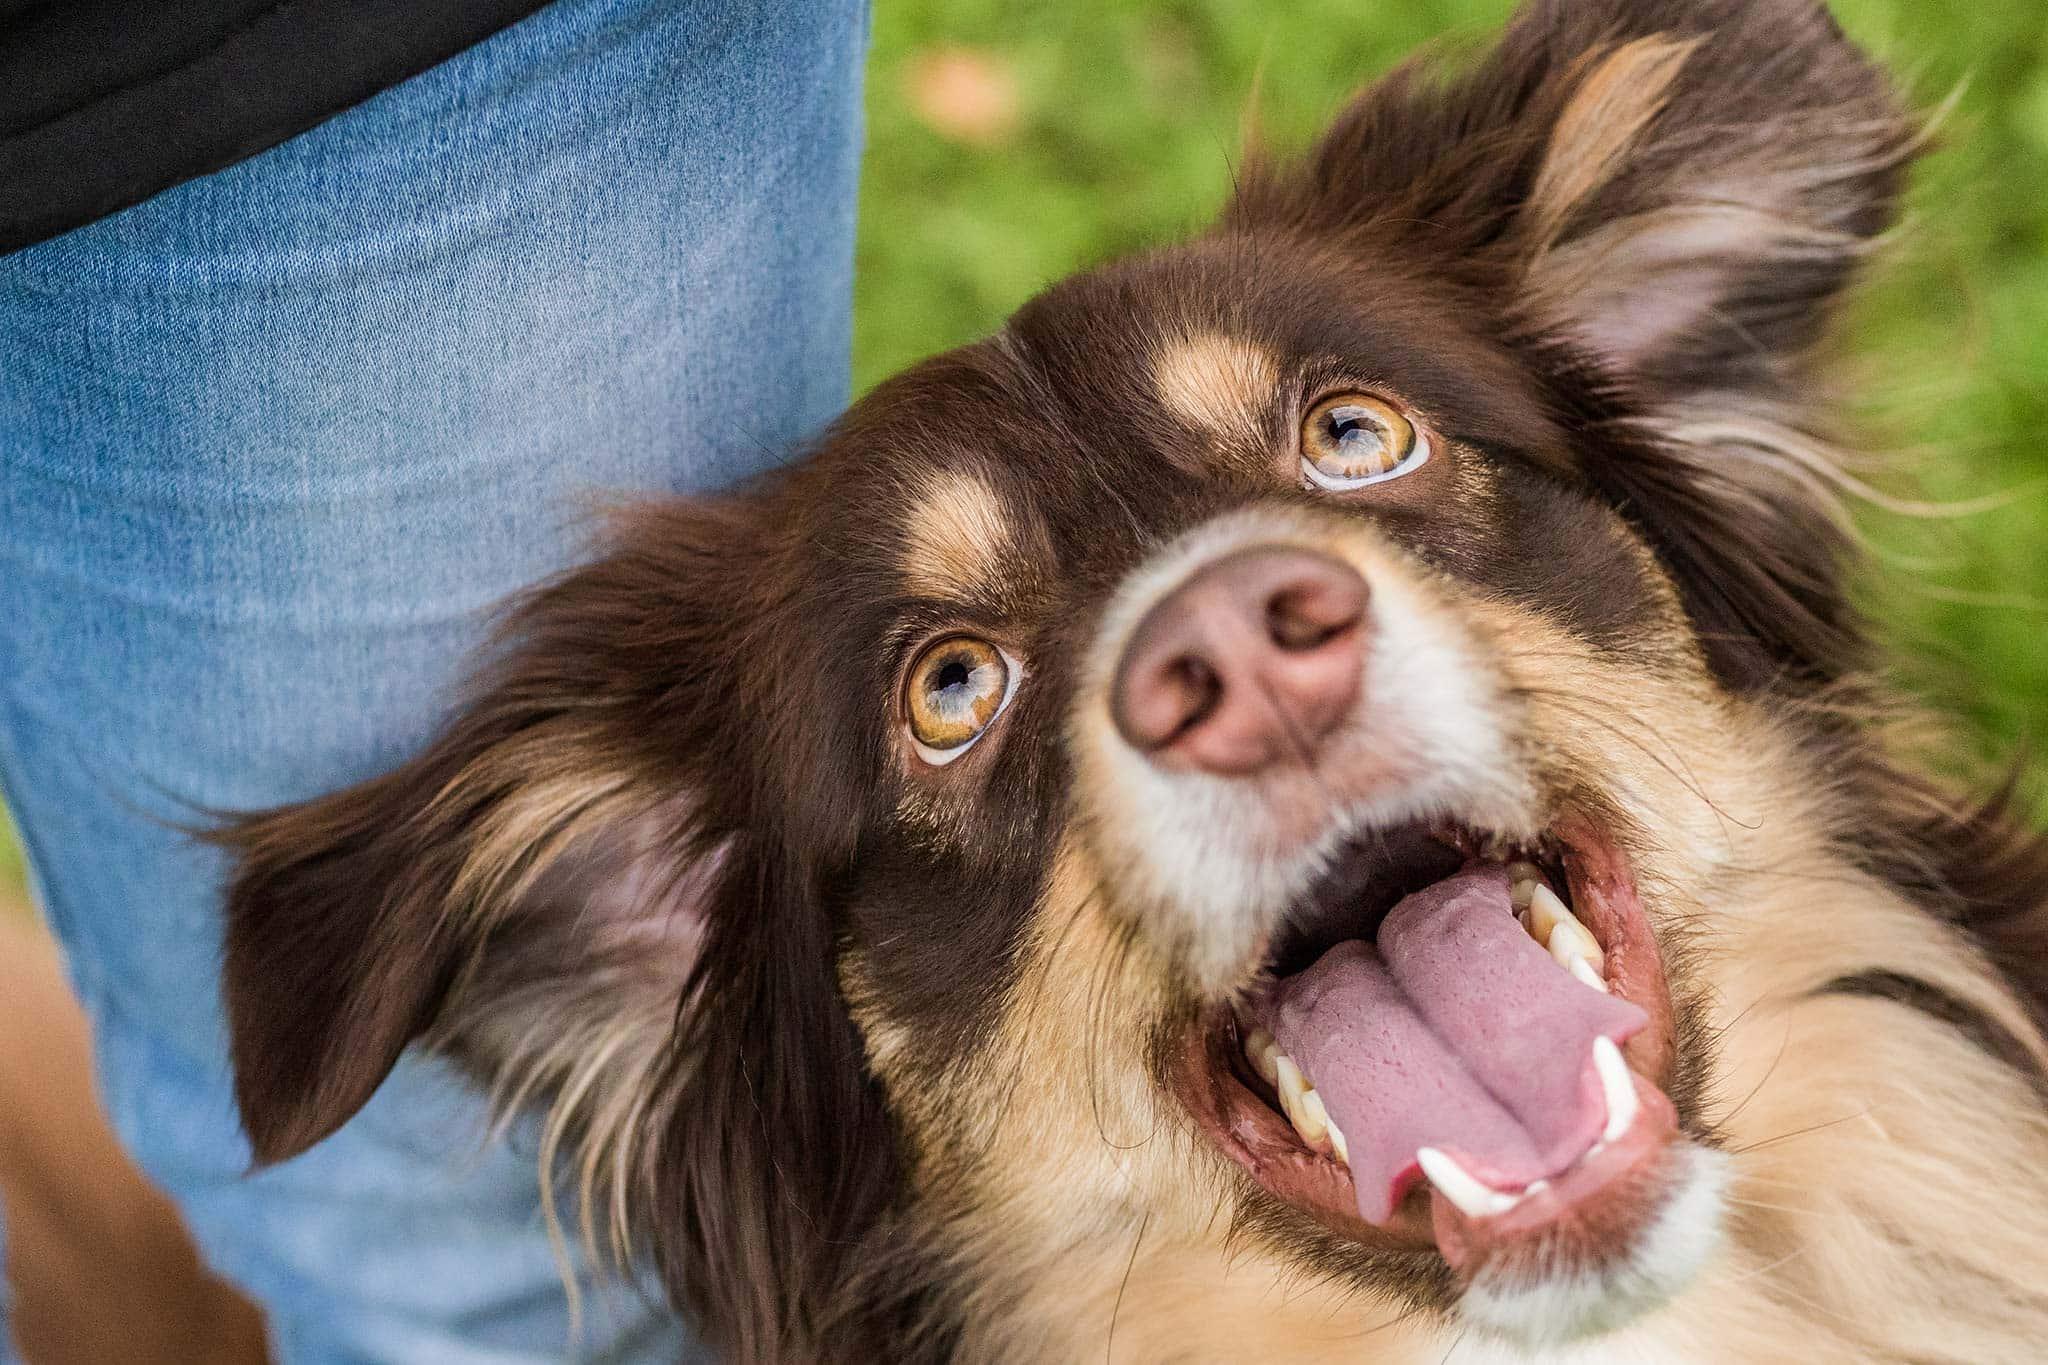 Australian Shepherd, Rettungshund - Hundefotografie und Tierfotografie in Potsdam von Sophia Zoike Photography